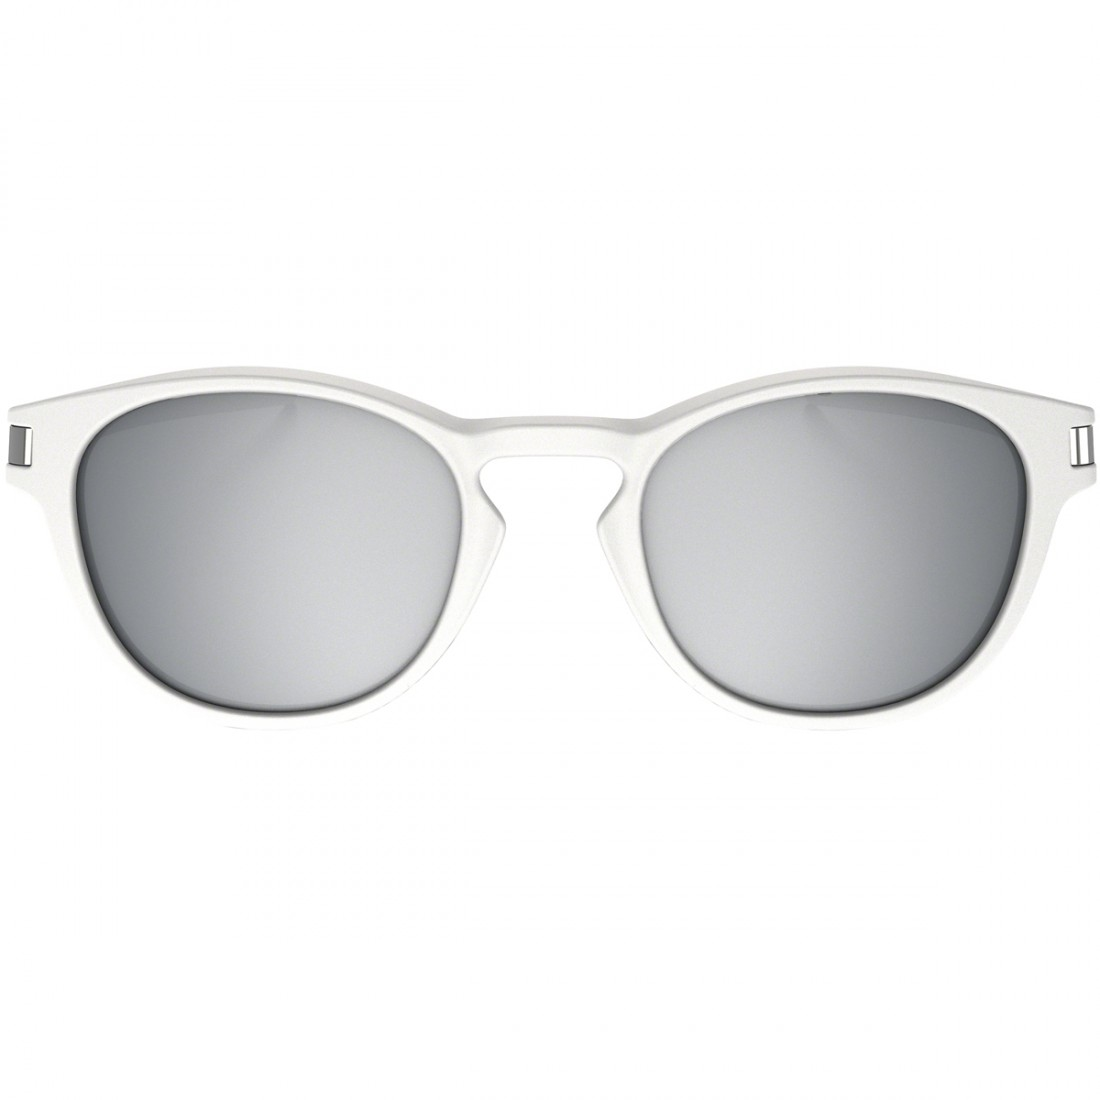 b344312334a OAKLEY Latch Matte White   Chrome Iridium Sun glasses · Motocard Oakley  Valve Polished Black Oakley Scalpel White Chrome Ice iridium Polarized ...